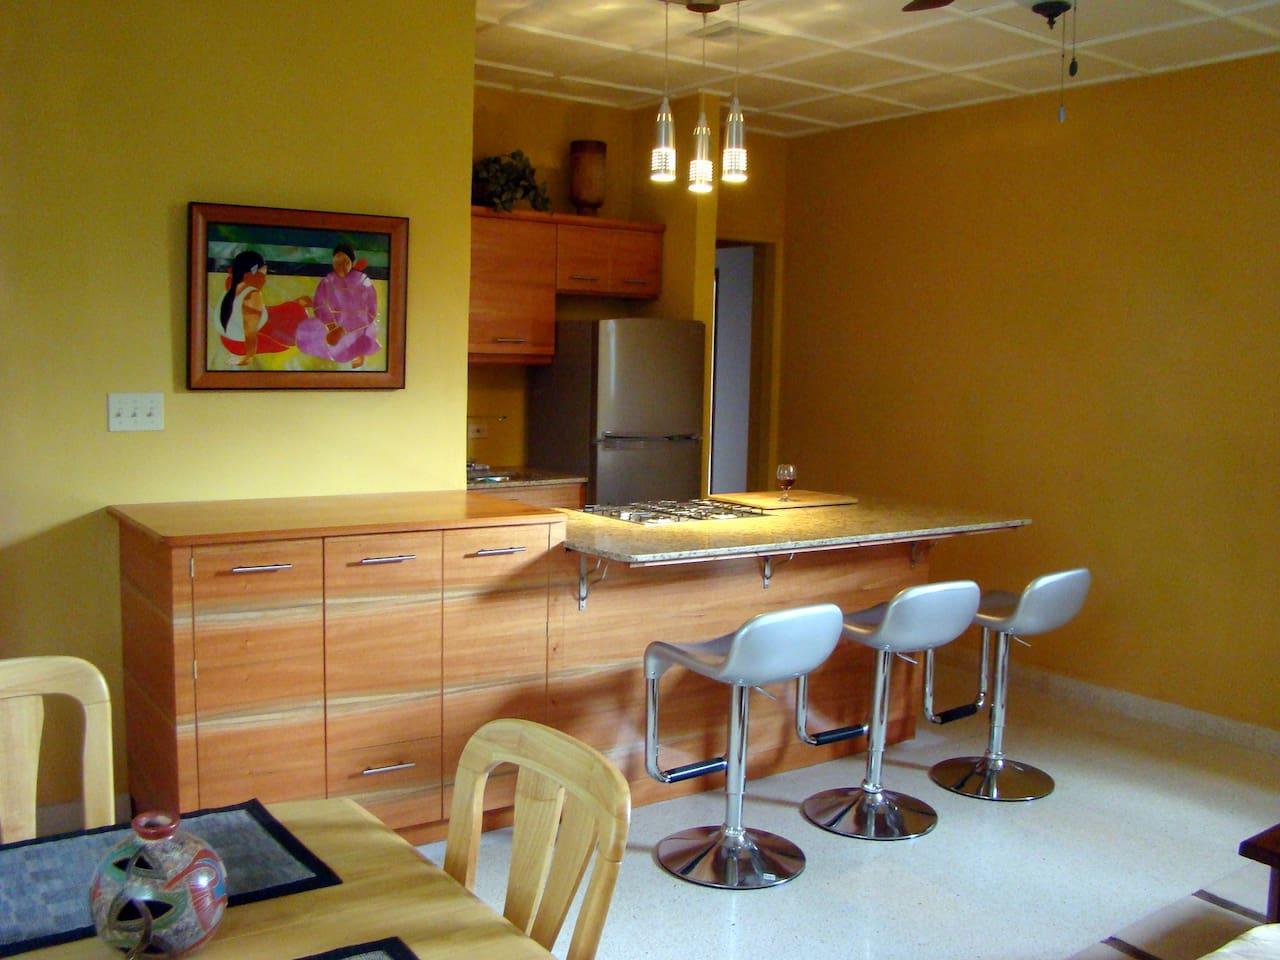 Stainless steel kitchen, granite countertops, custom cabinets-